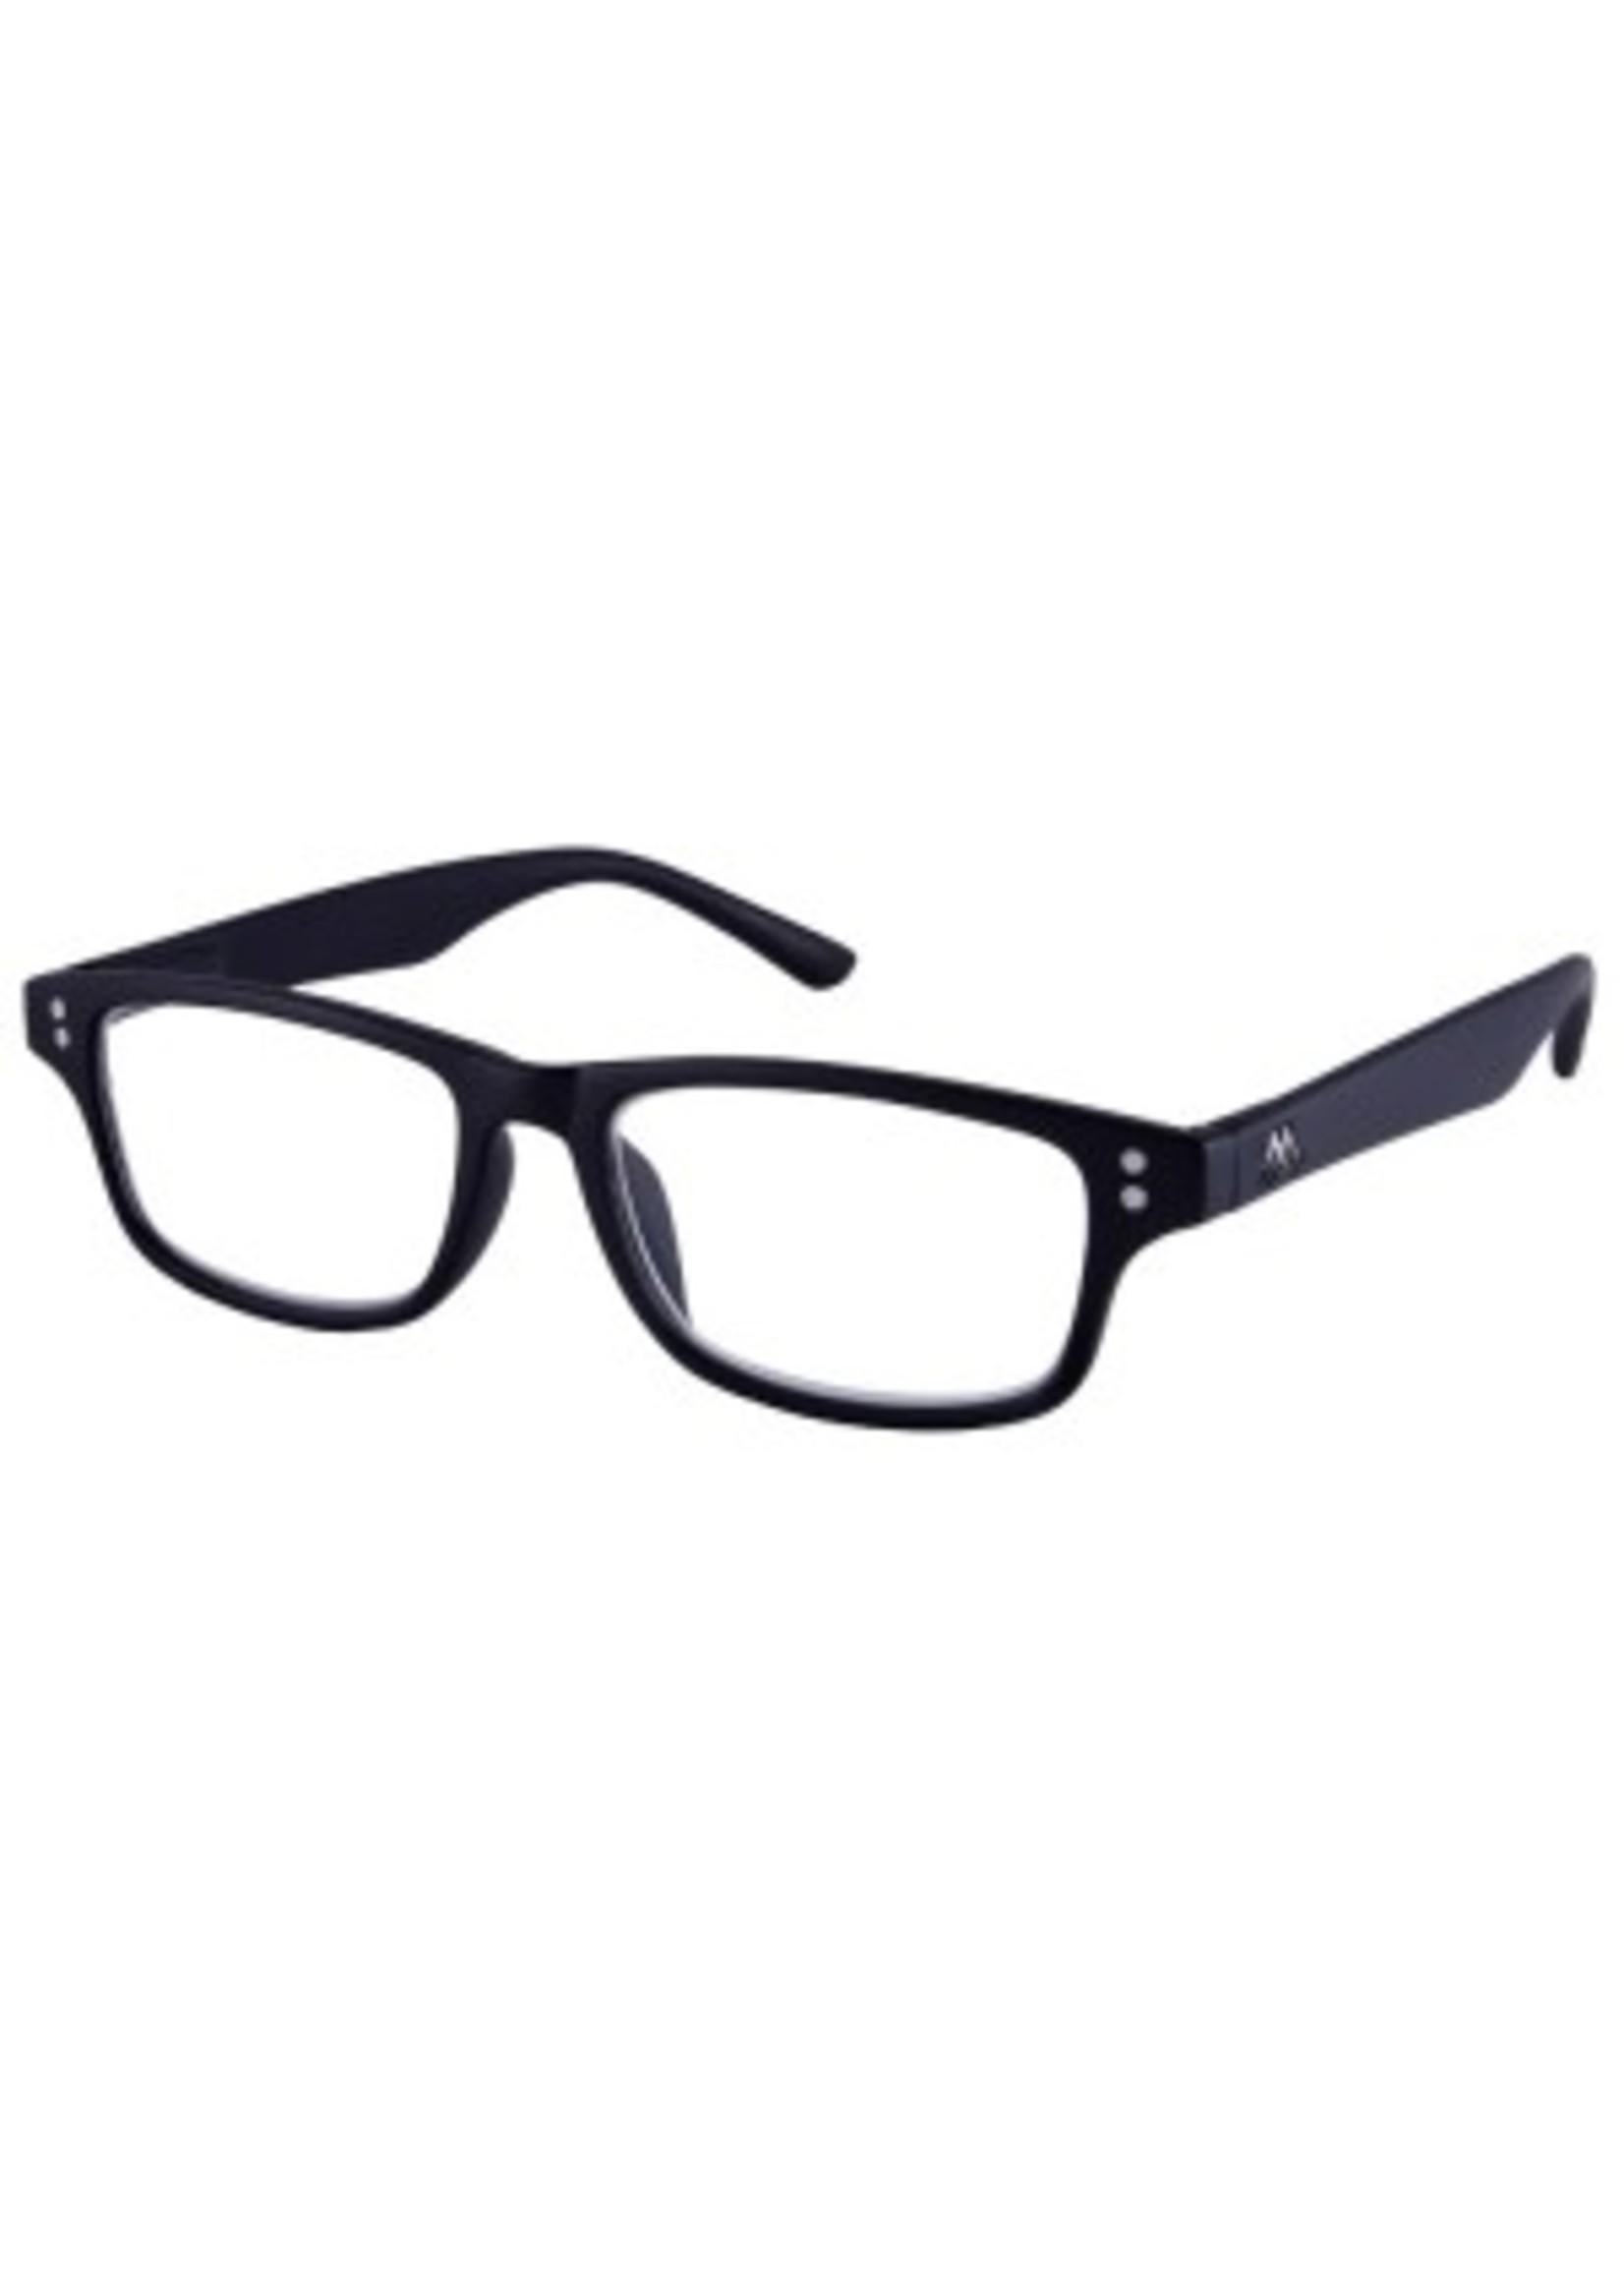 Moderne unisex leesbril in zwart